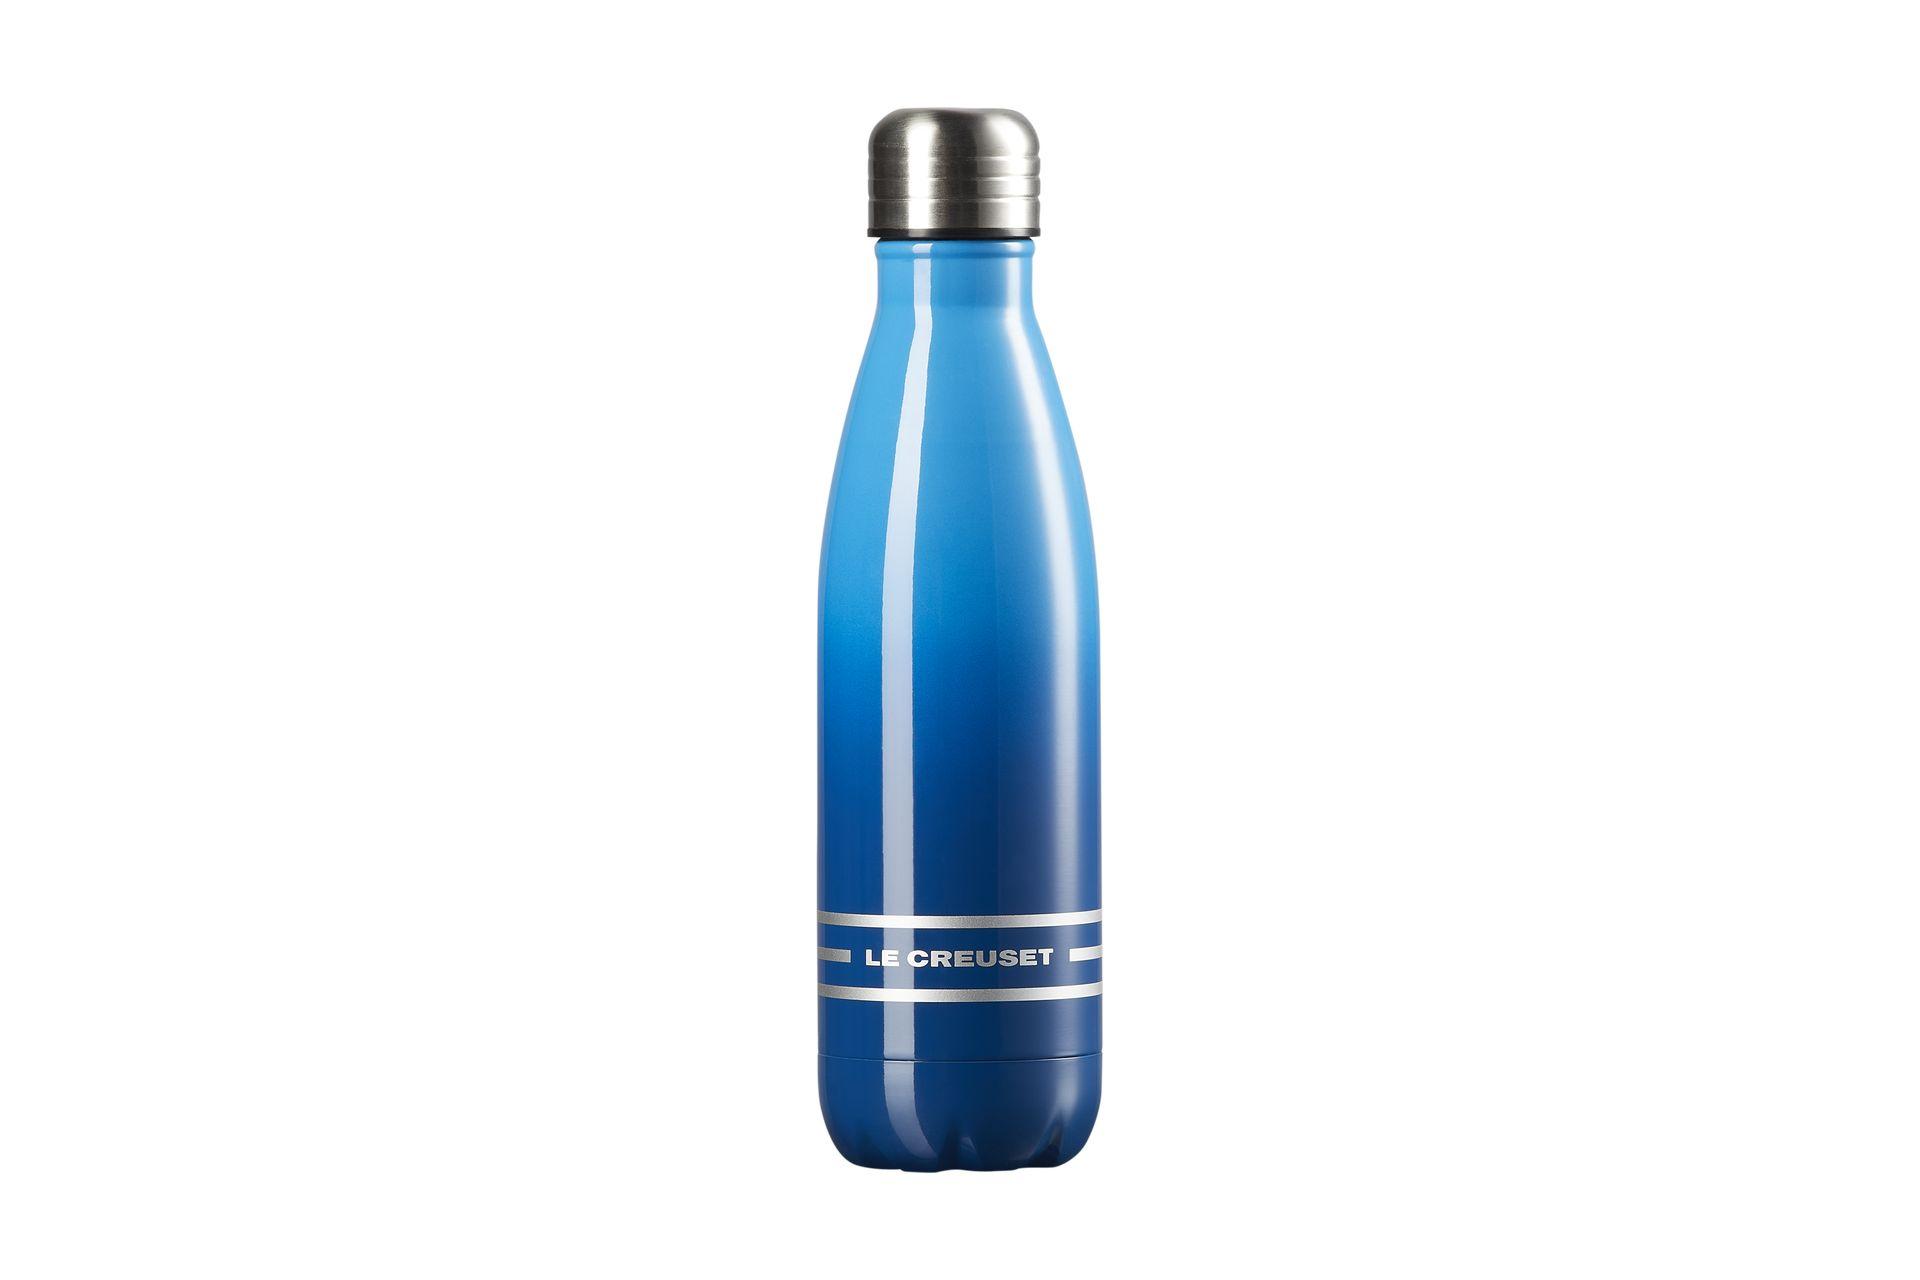 Le Creuset Trinkflasche 500 ml Marseille